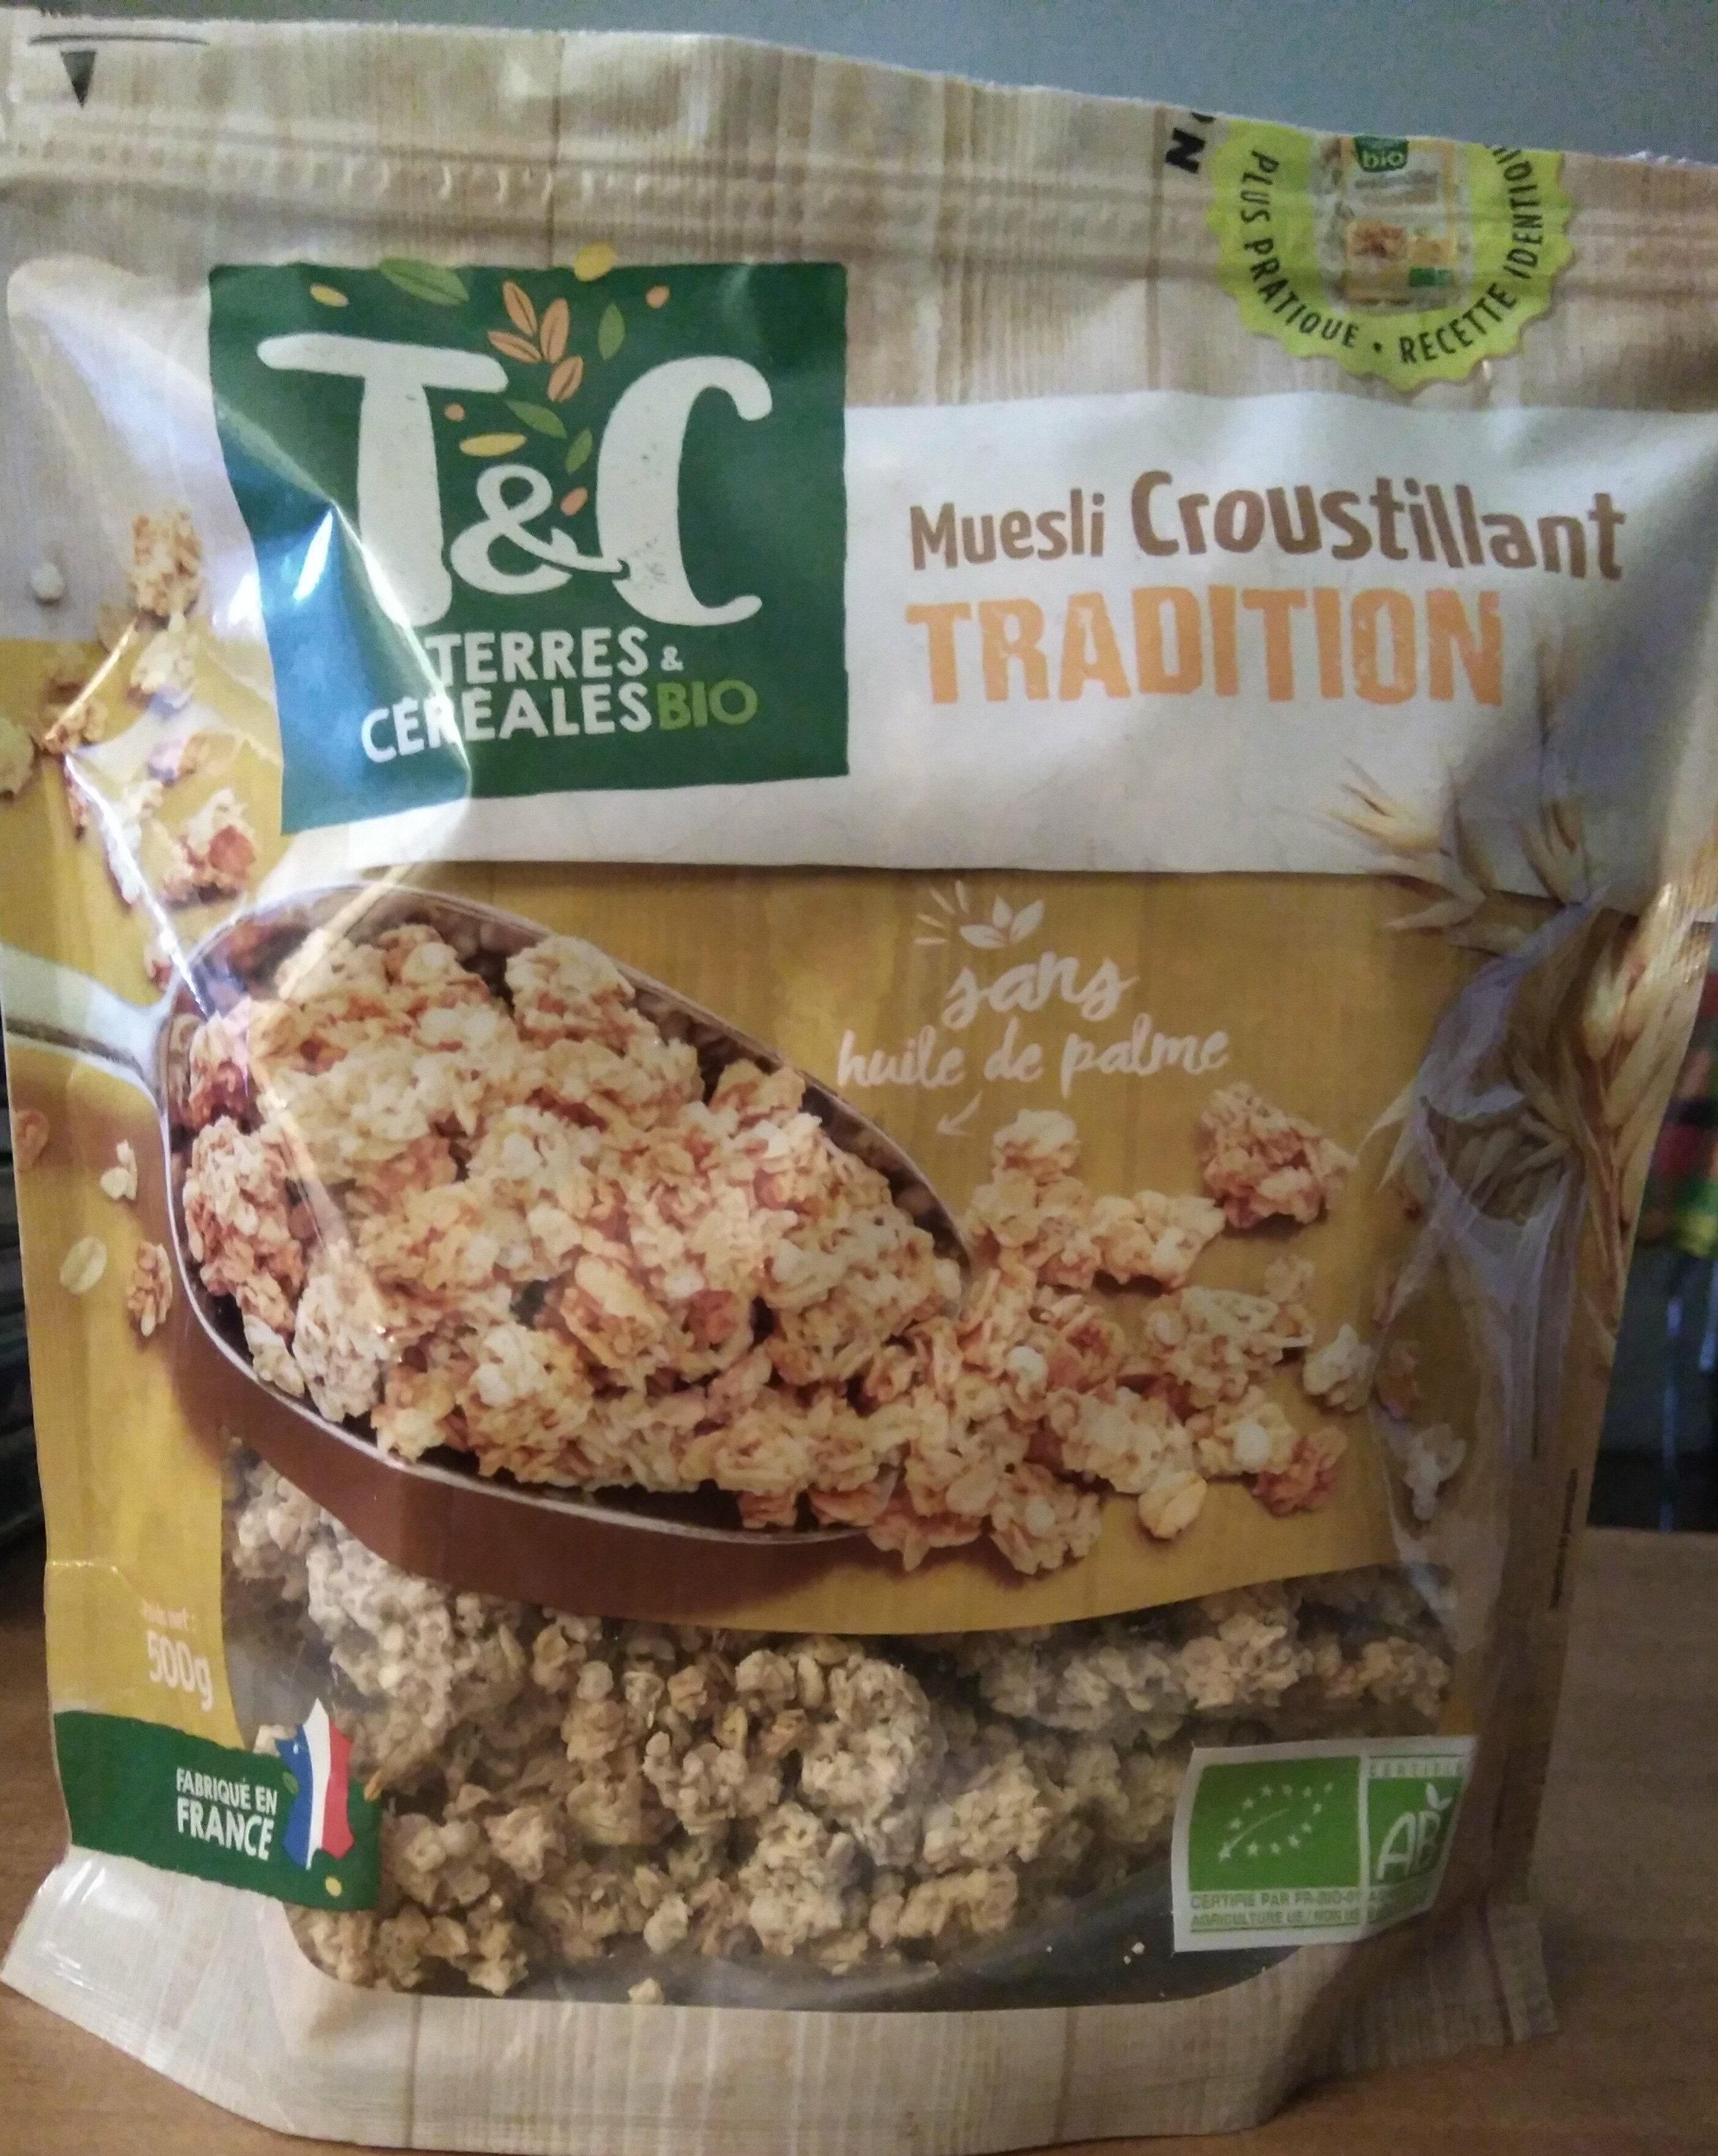 Muesli croustillant tradition - Product